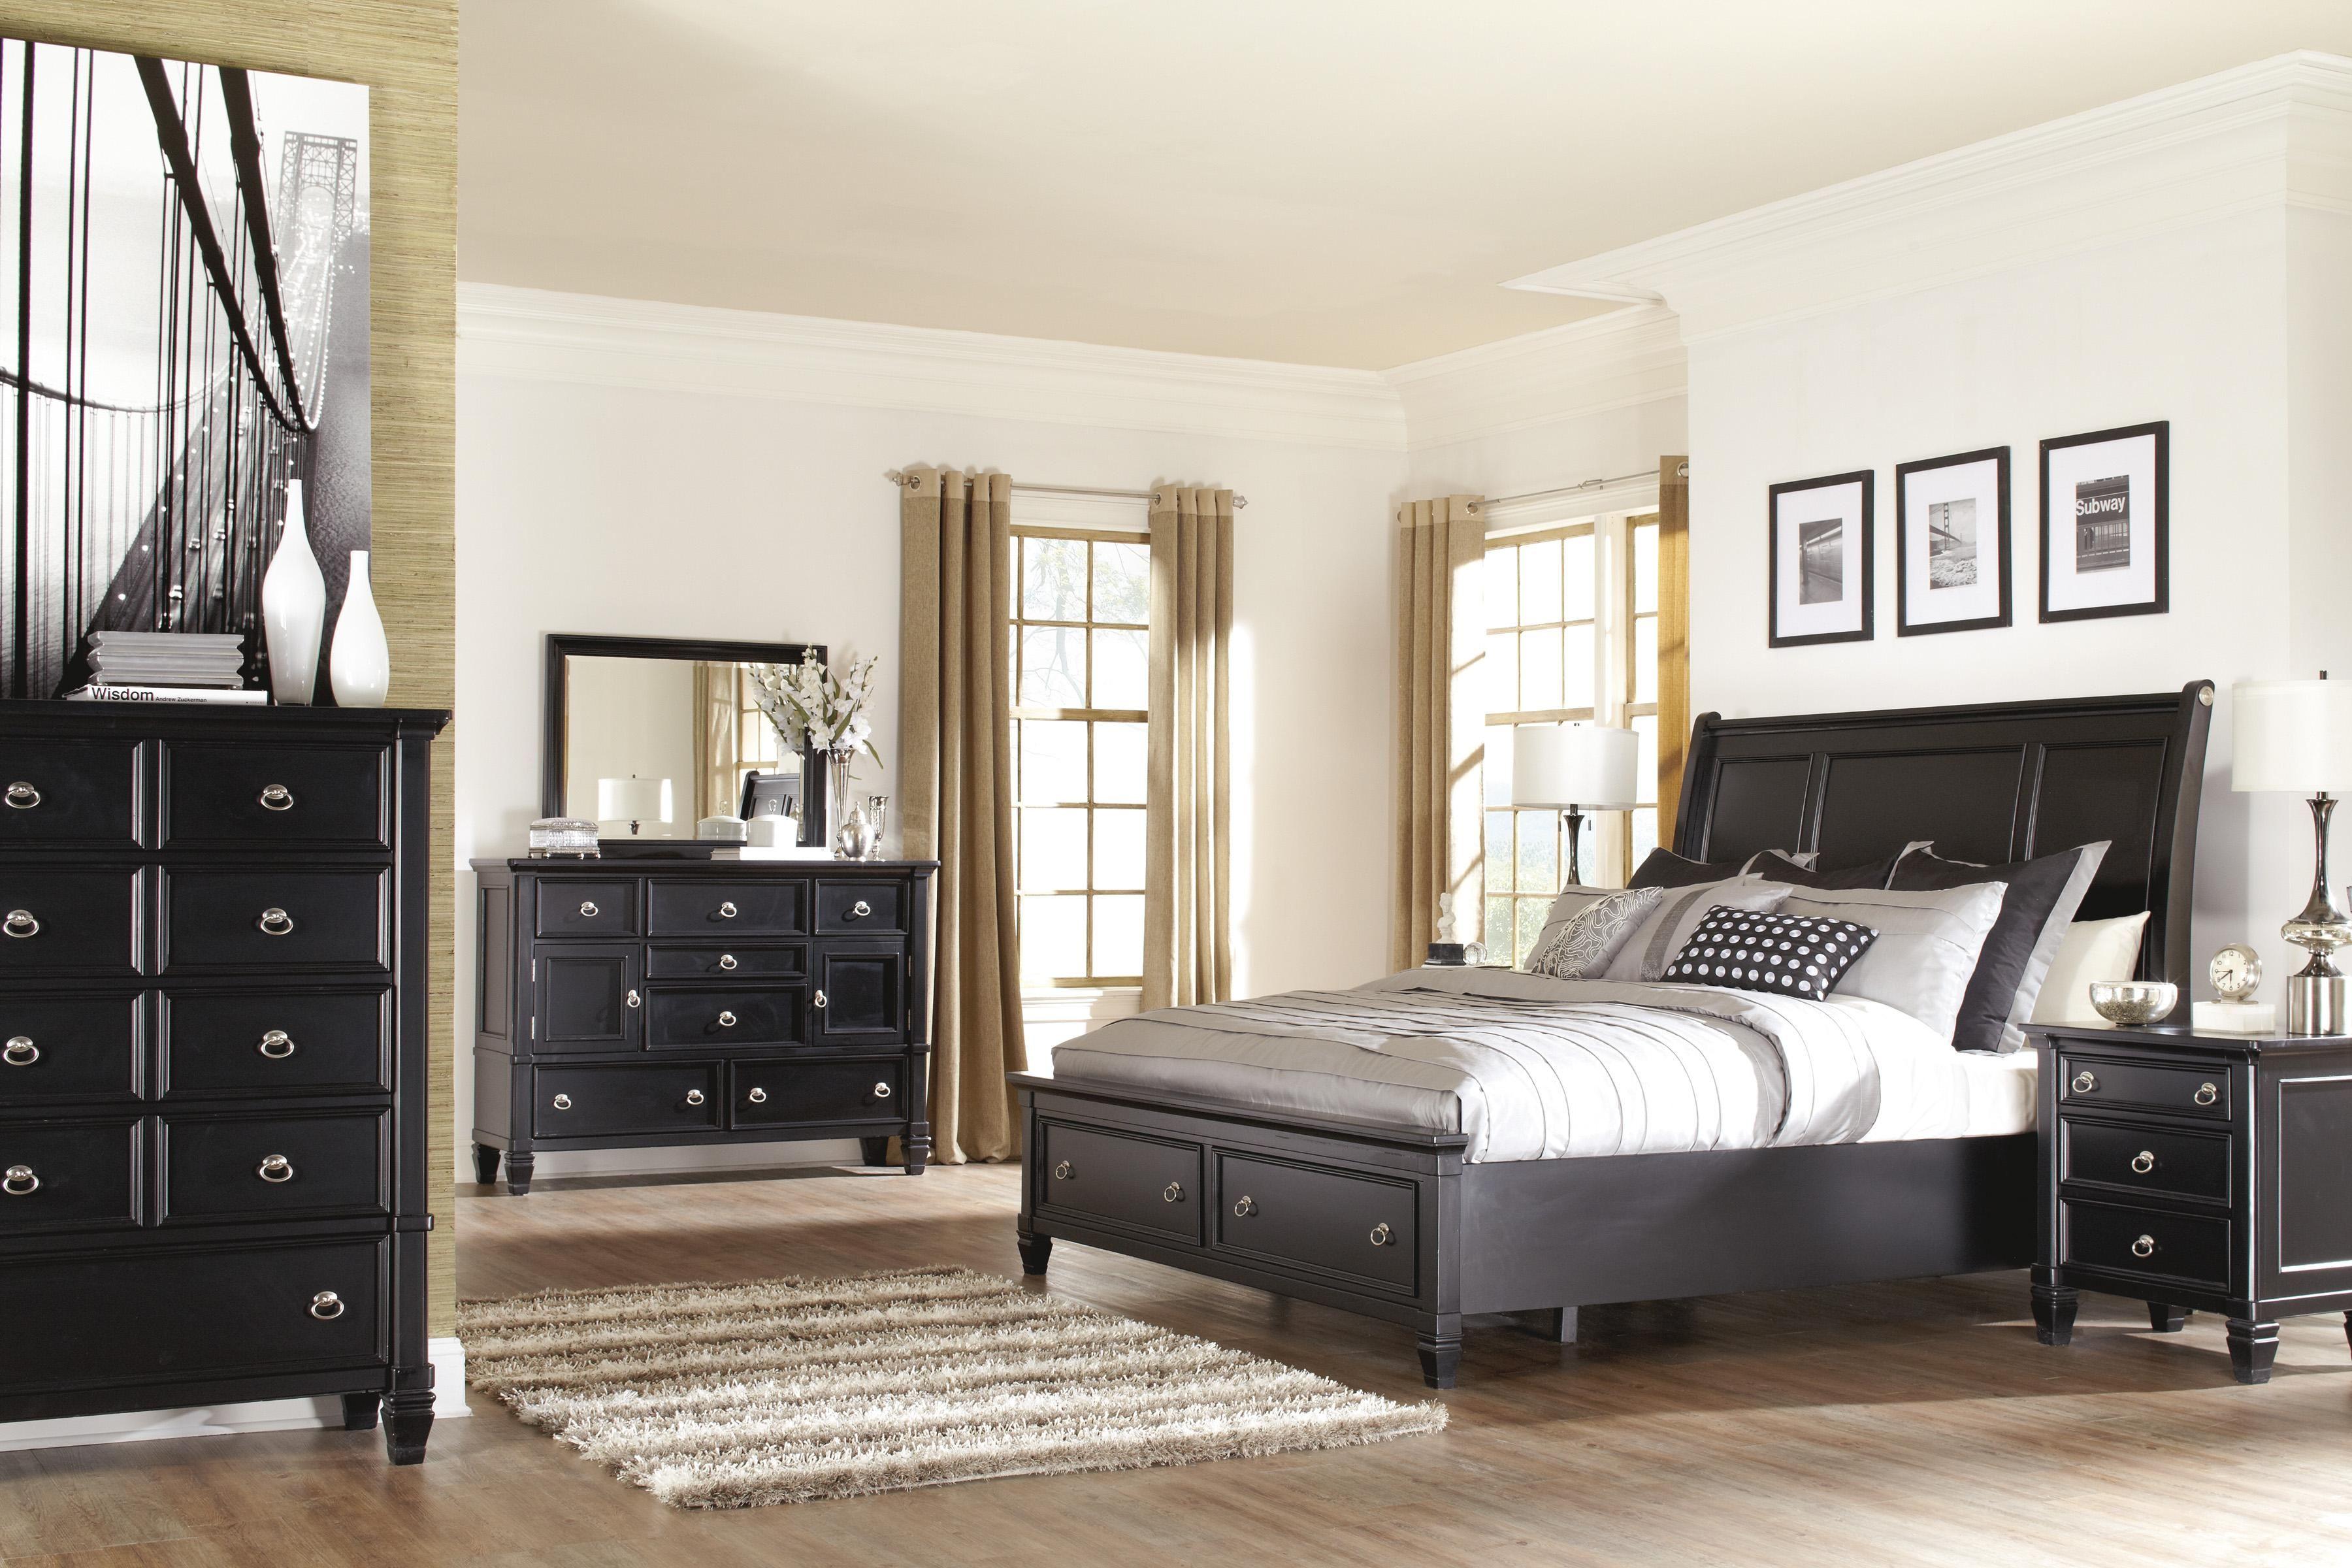 Etonnant Marlo Furniture U2013 Rockville 725 Rockville Pike Rockville, MD 20852  301 738 9000